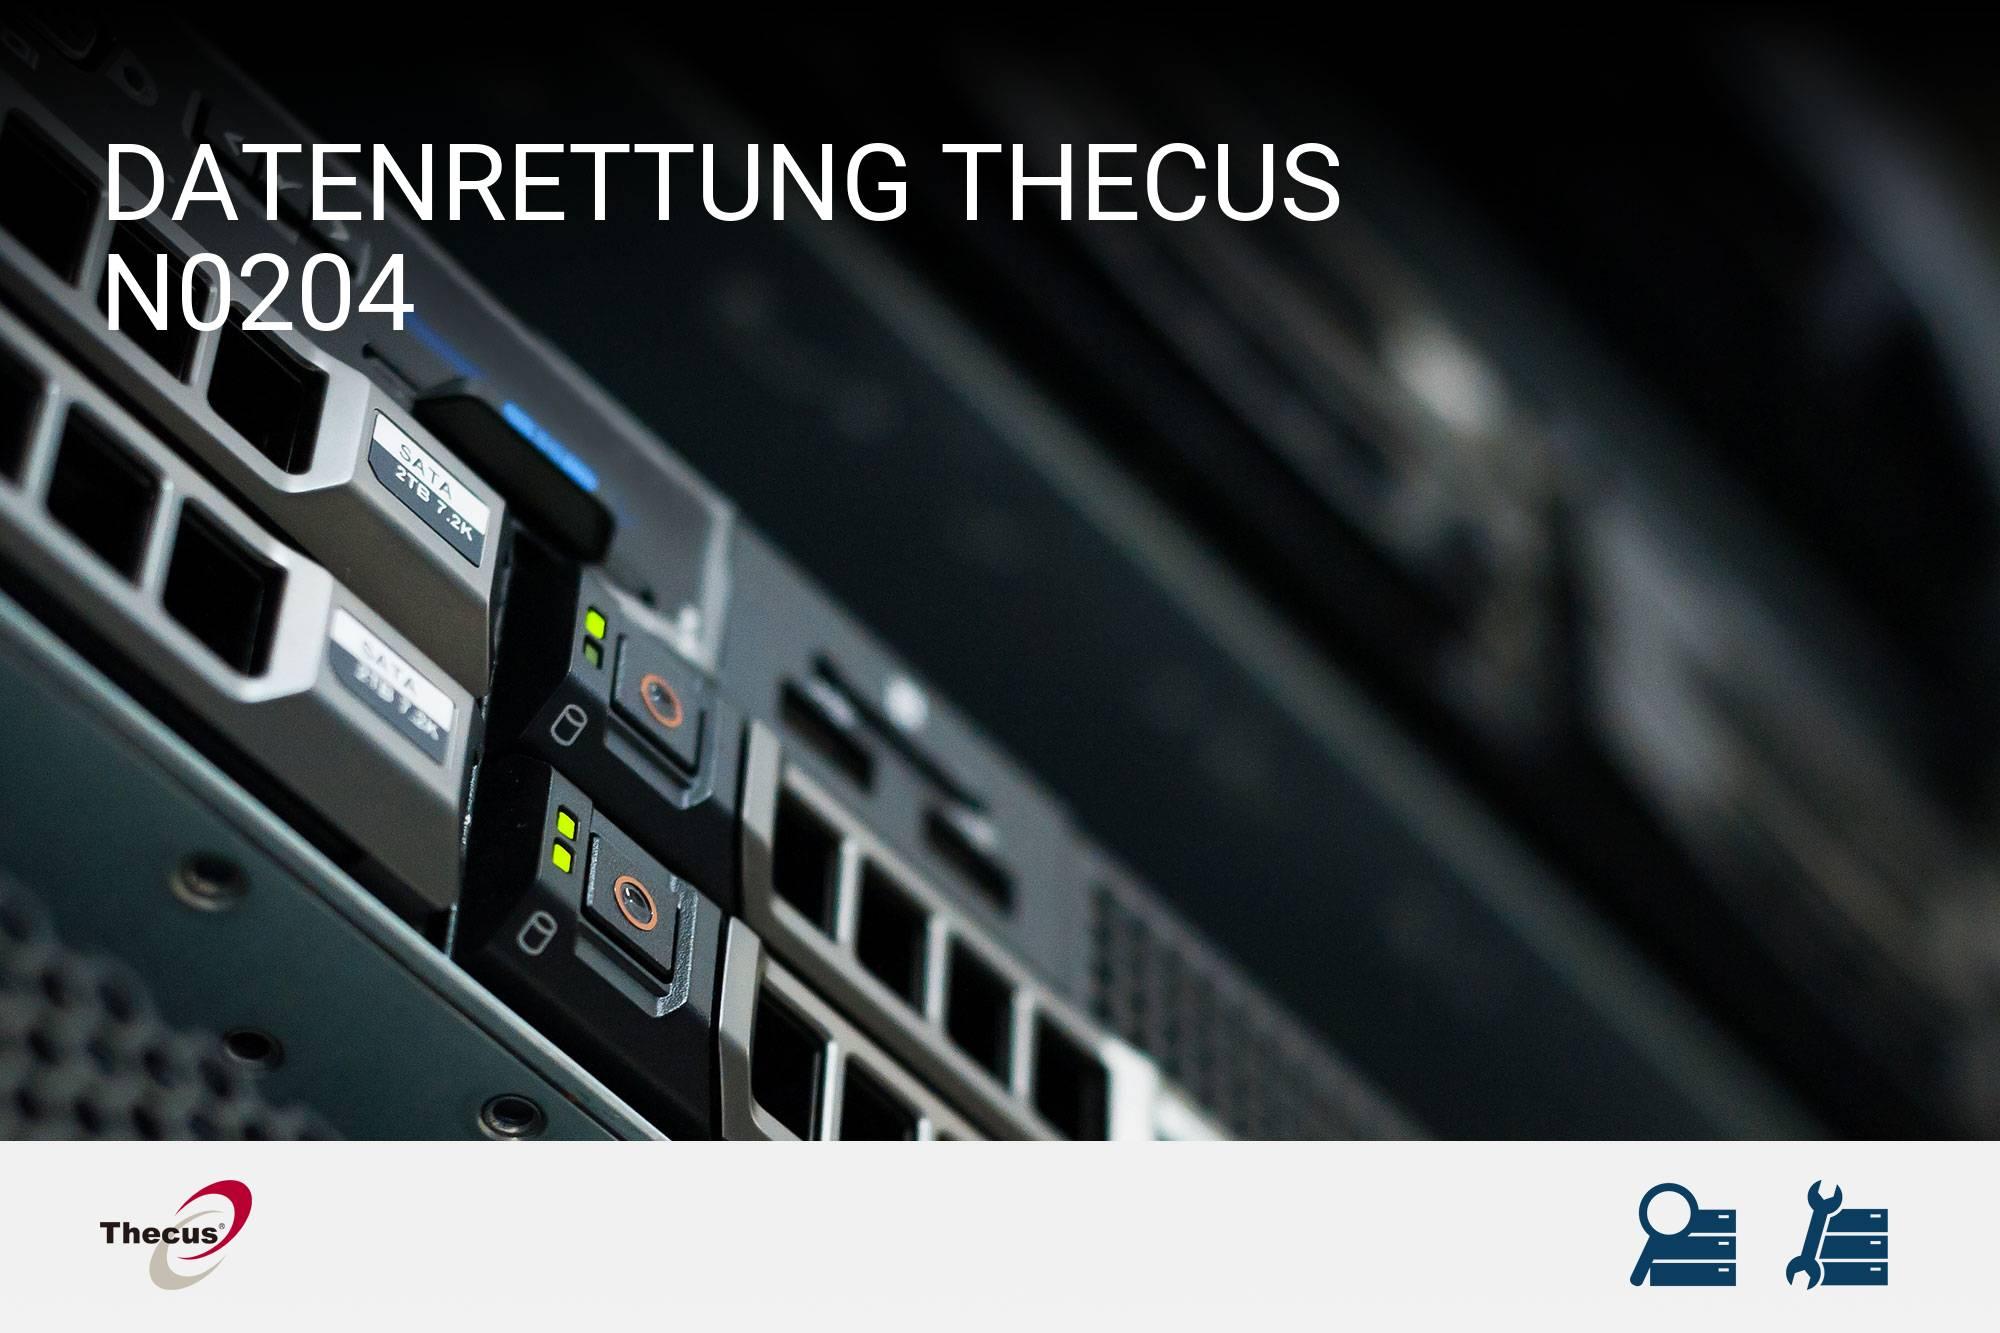 Thecus N0204